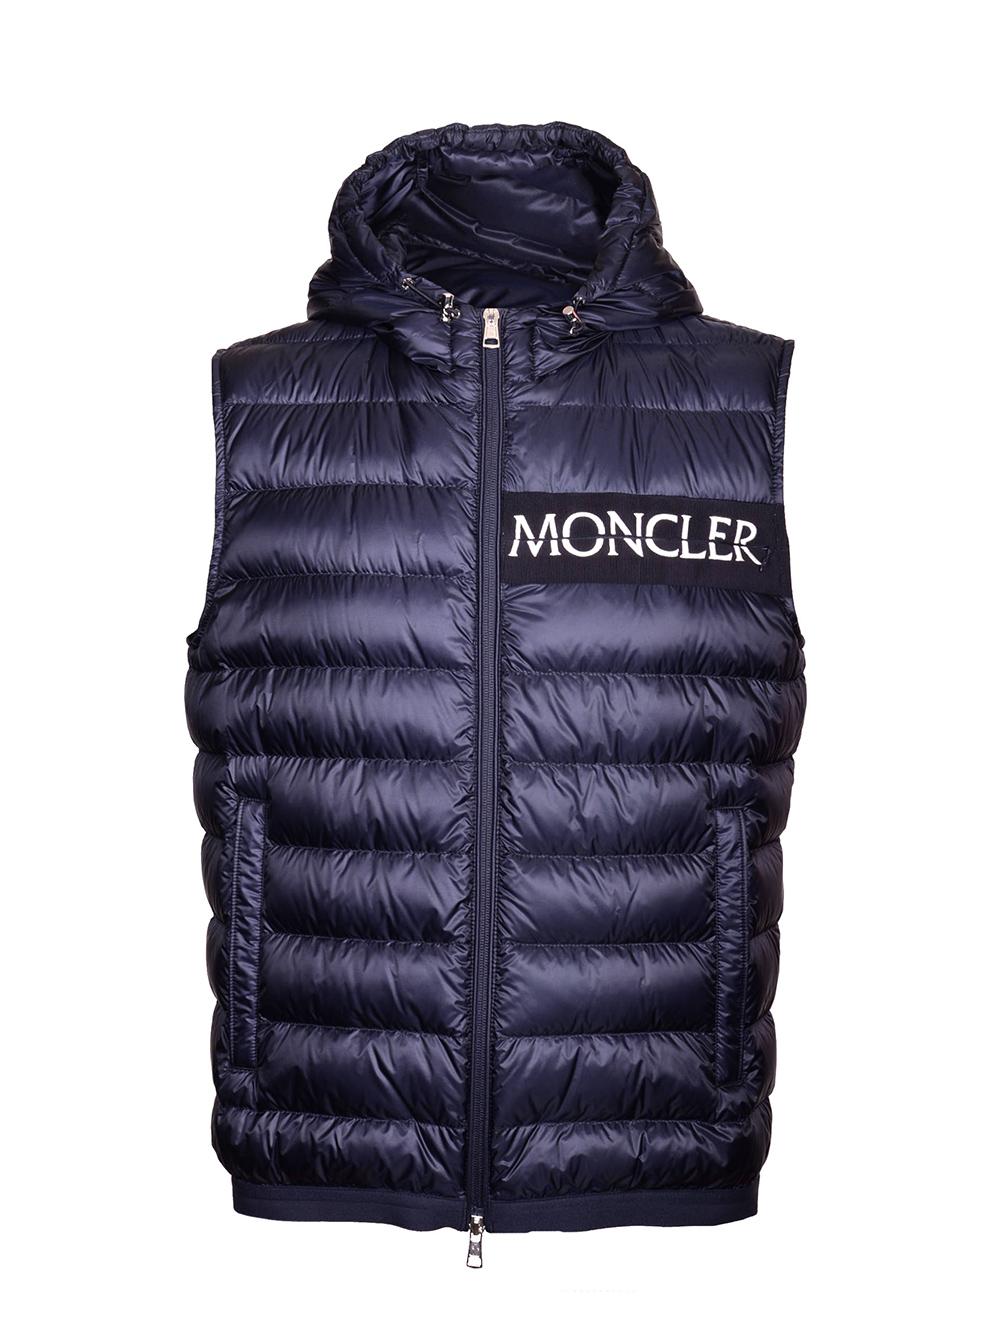 MONCLER Μπουφάν αμάνικο E1-091-4334494 ΜΠΛΕ